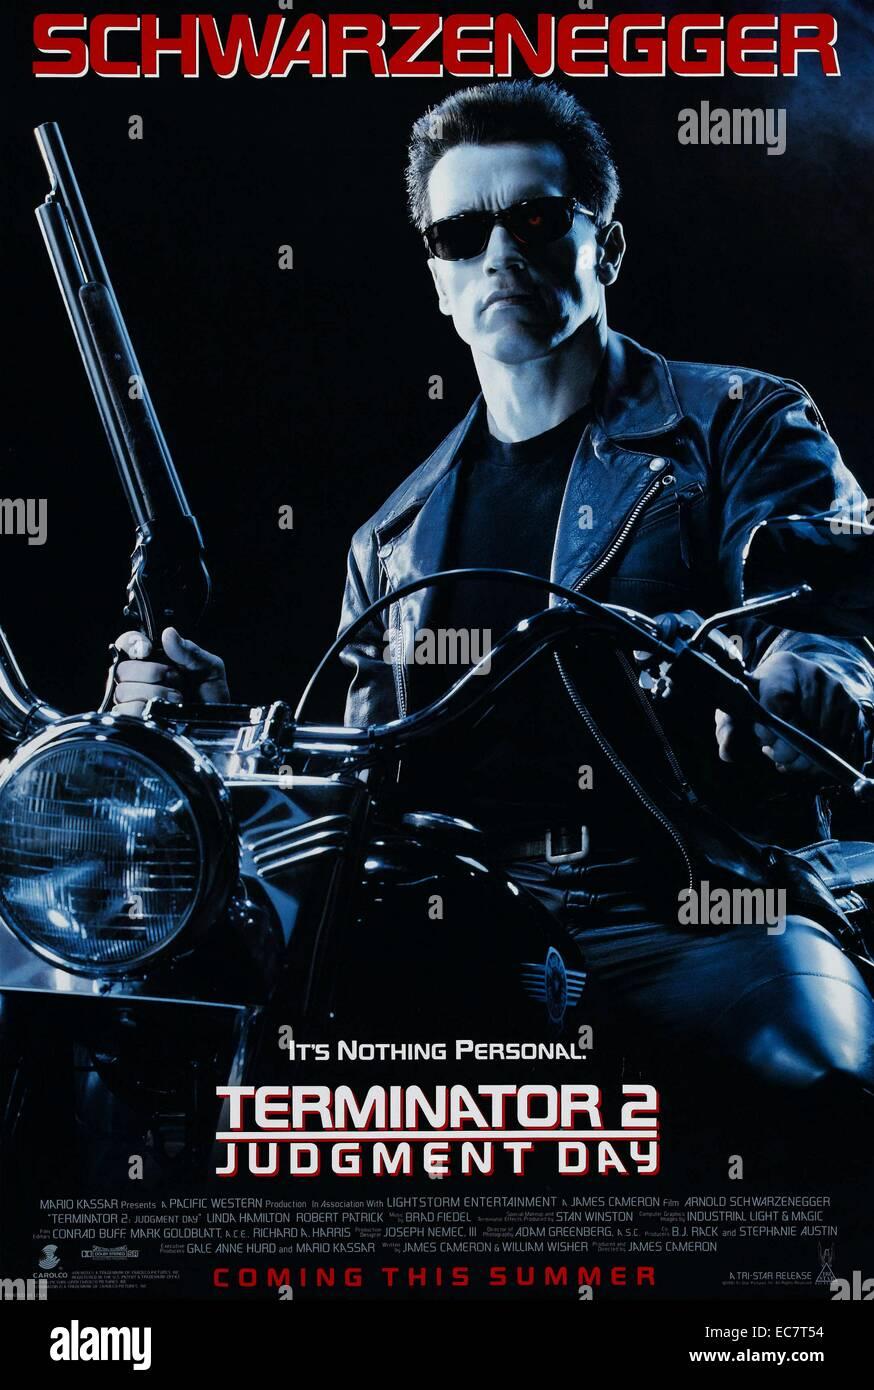 Terminator 2: Judgement Day - Stock Image